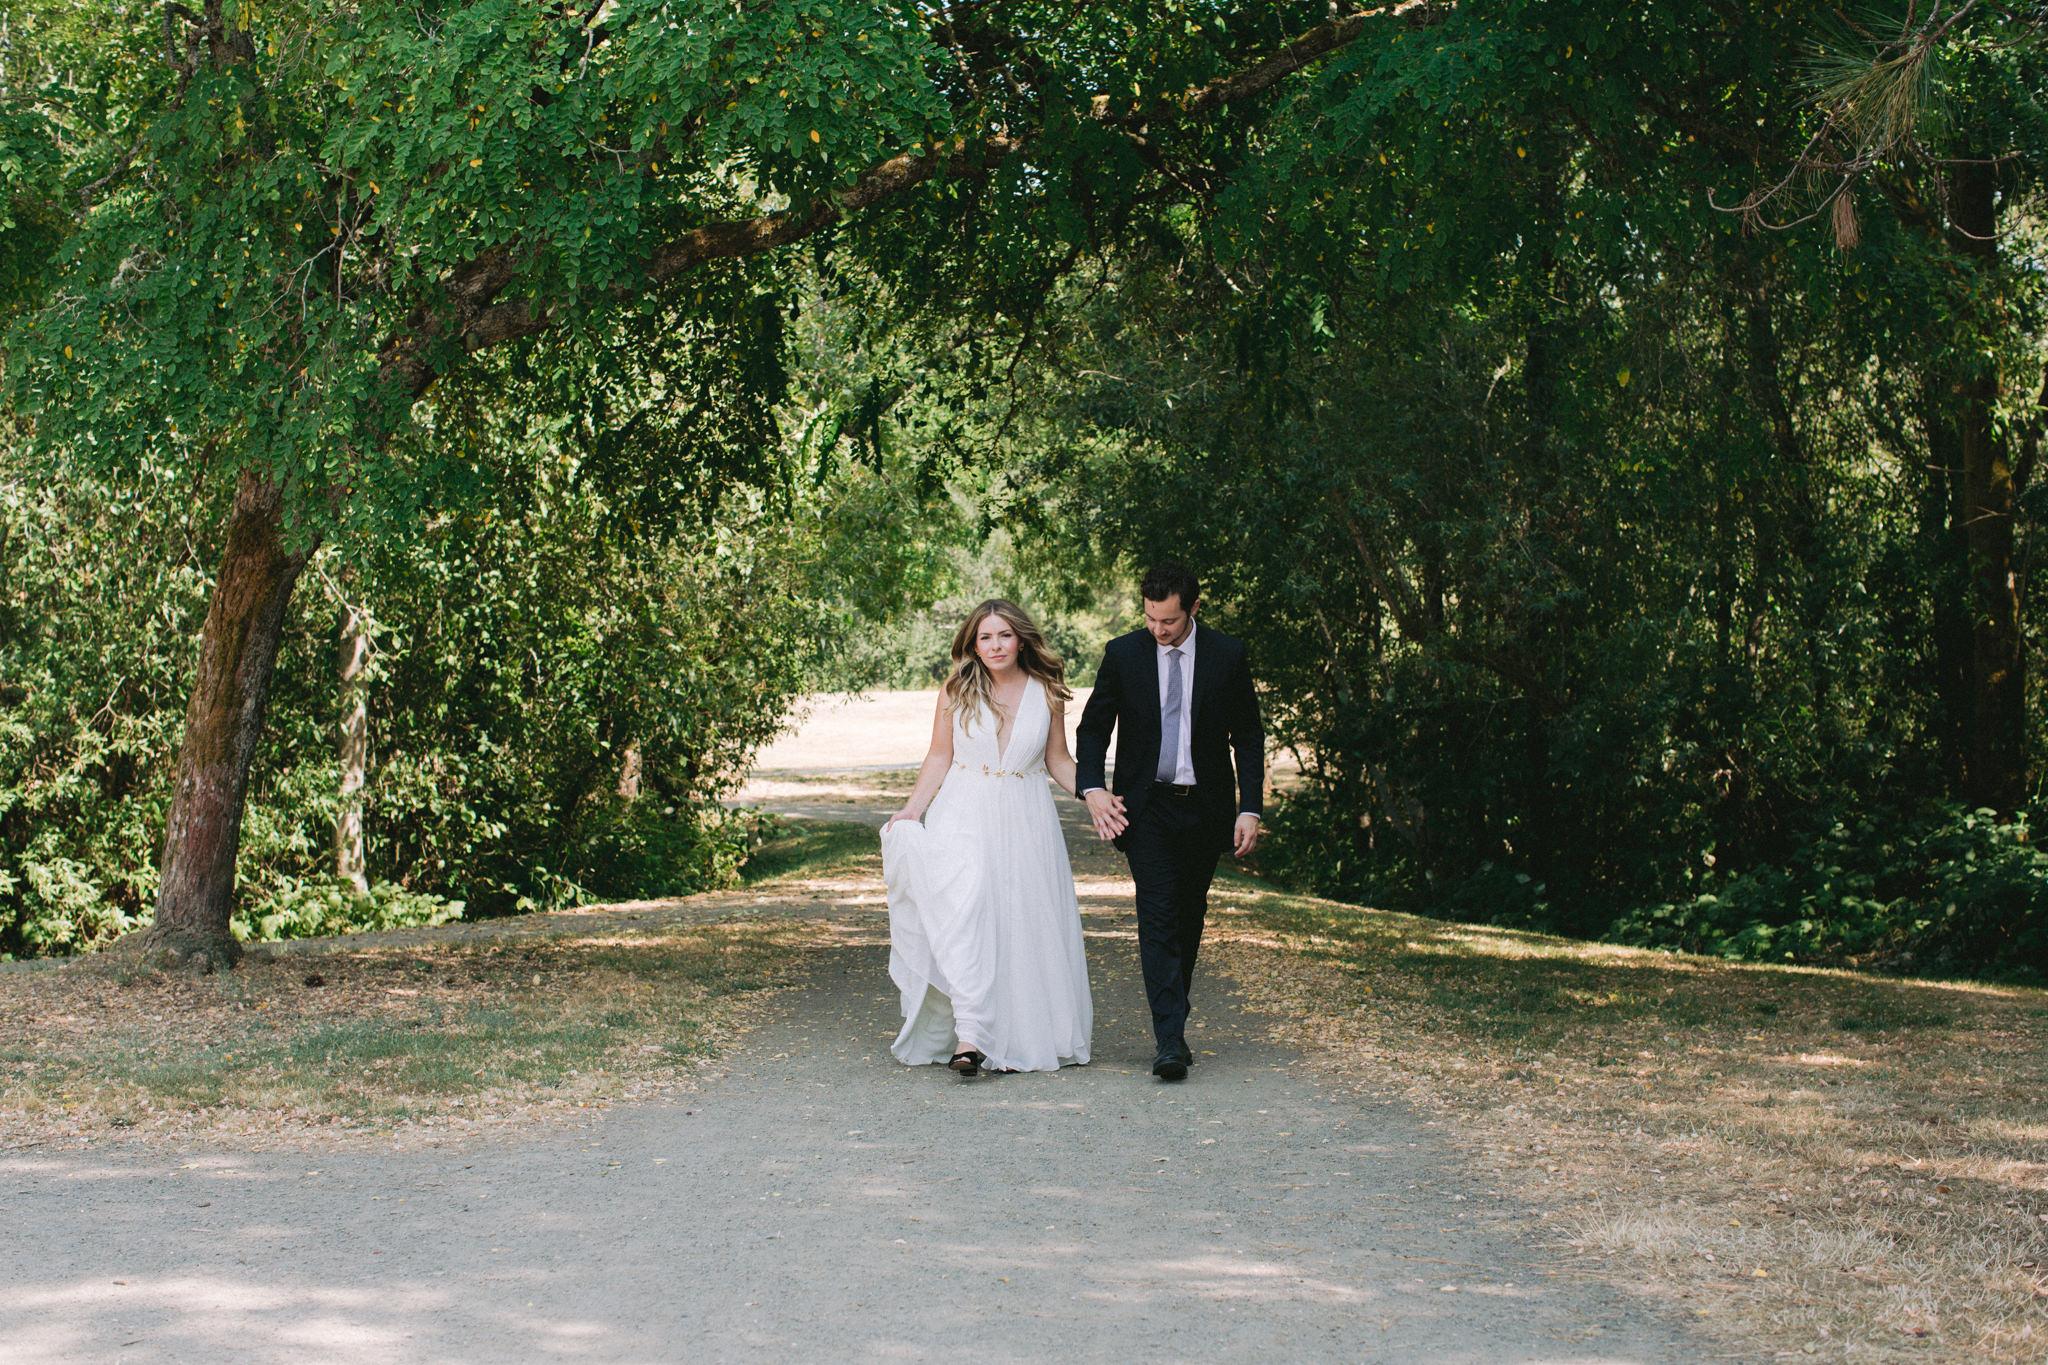 Backyard-Bainbridge-Island-Wedding-Alycia-Lovell-Photography-57.JPG